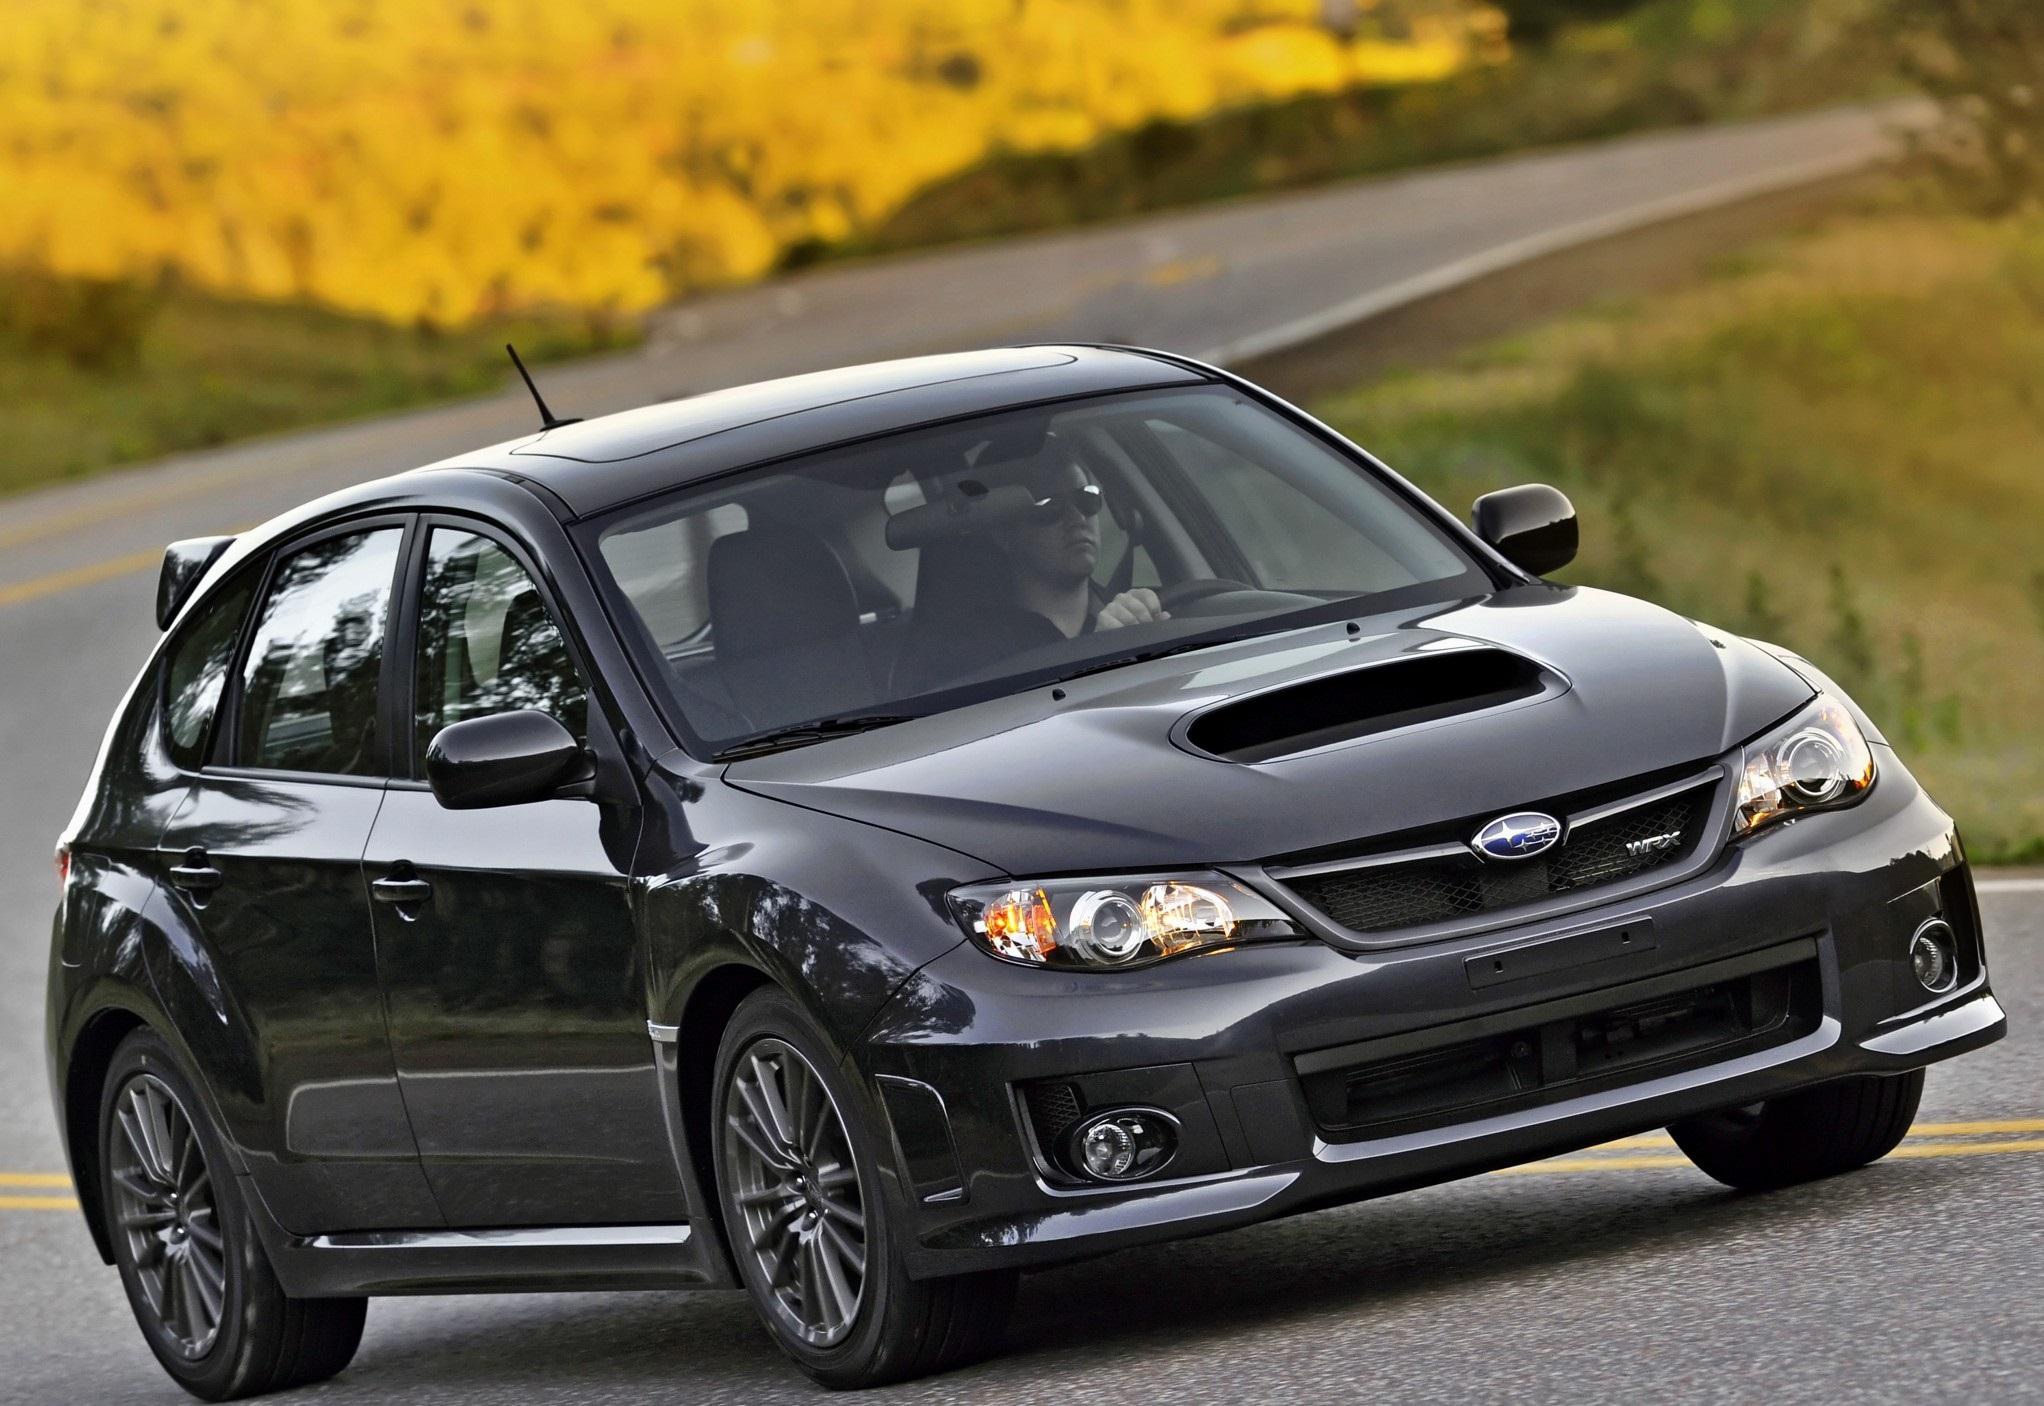 Subaru Wrx Computer Backgrounds